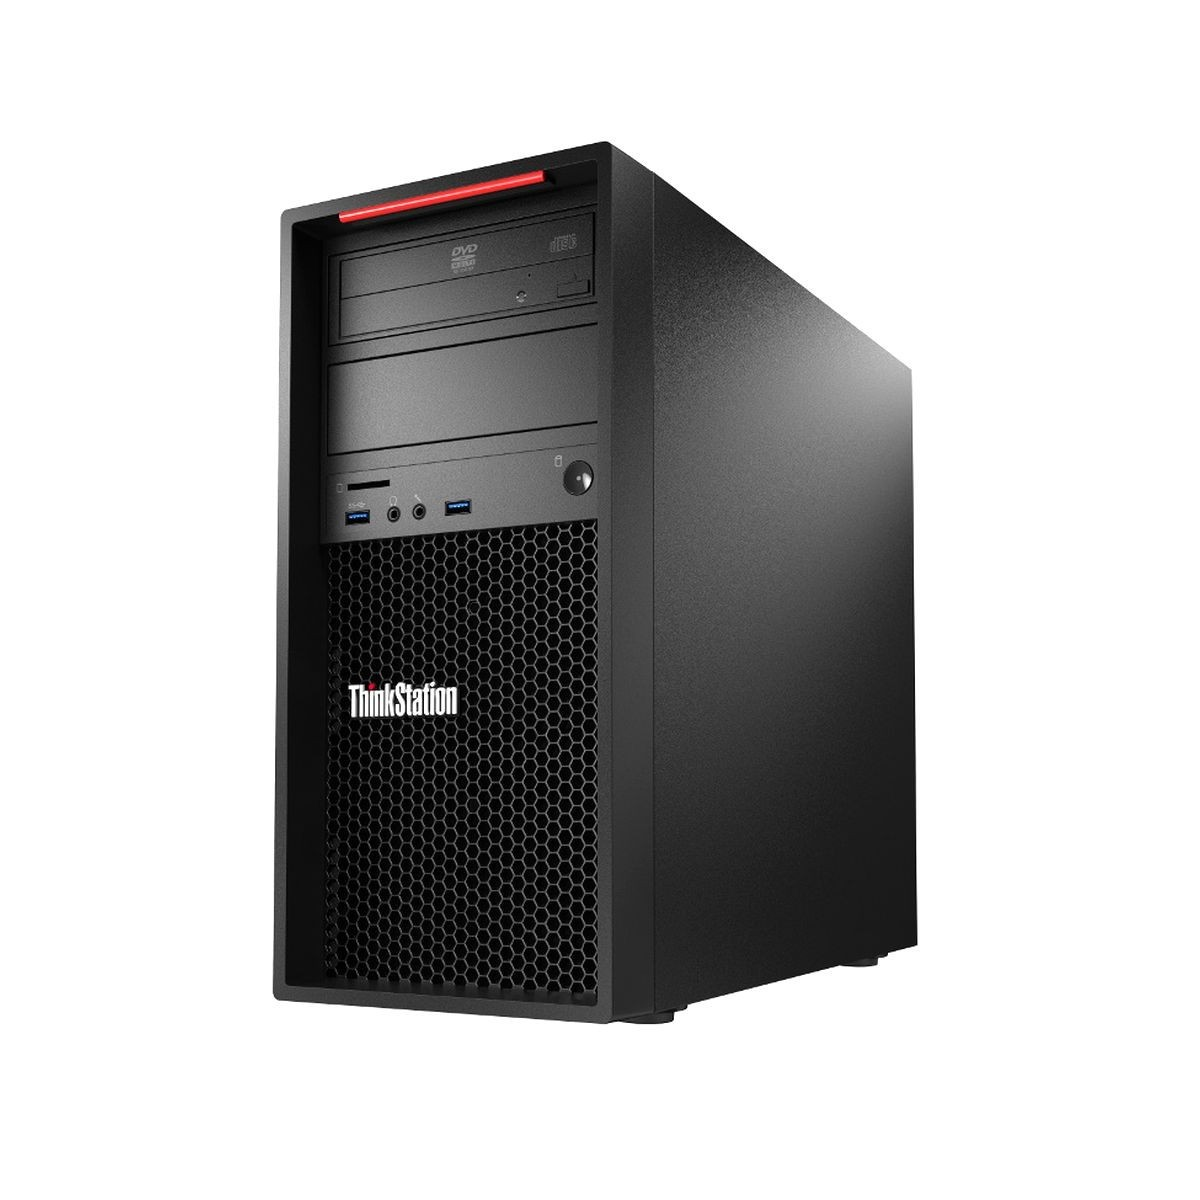 LENOVO P410 E5v4 16GB DDR4 256SSD NVME GT710 W10